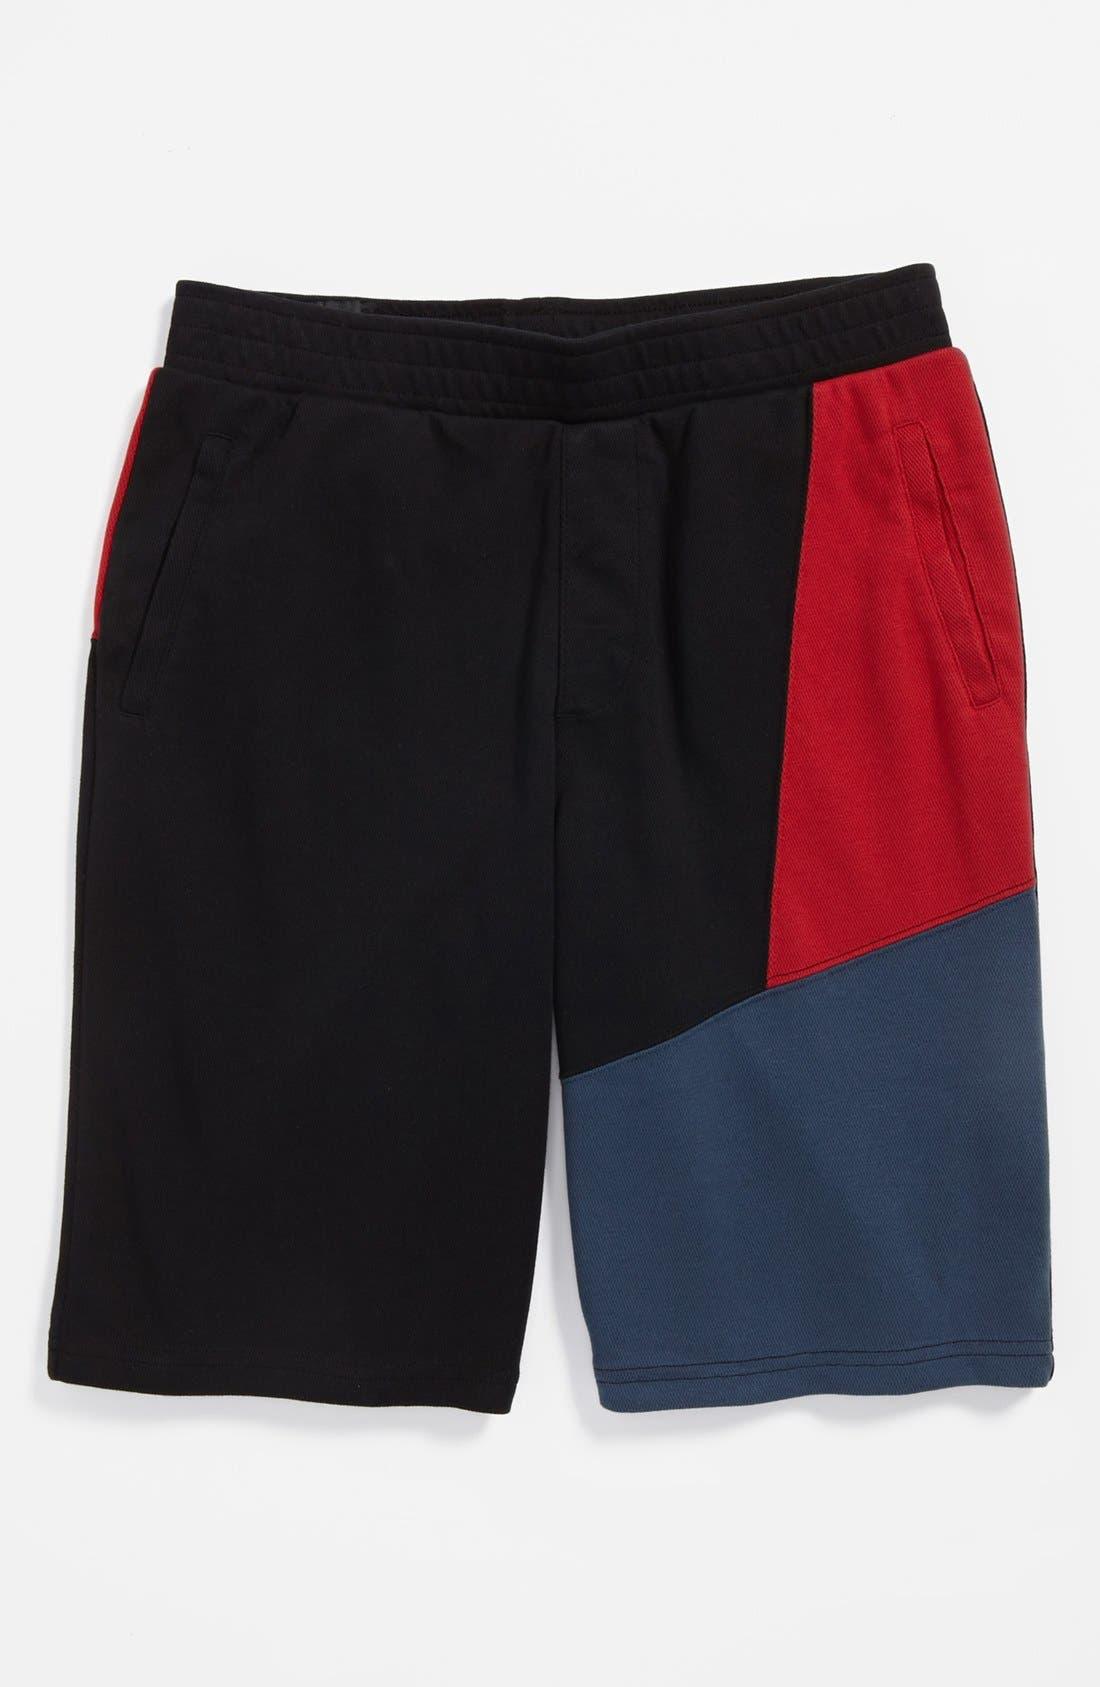 Alternate Image 1 Selected - Volcom 'Growler' Moisture Wicking Shorts (Little Boys & Big Boys)